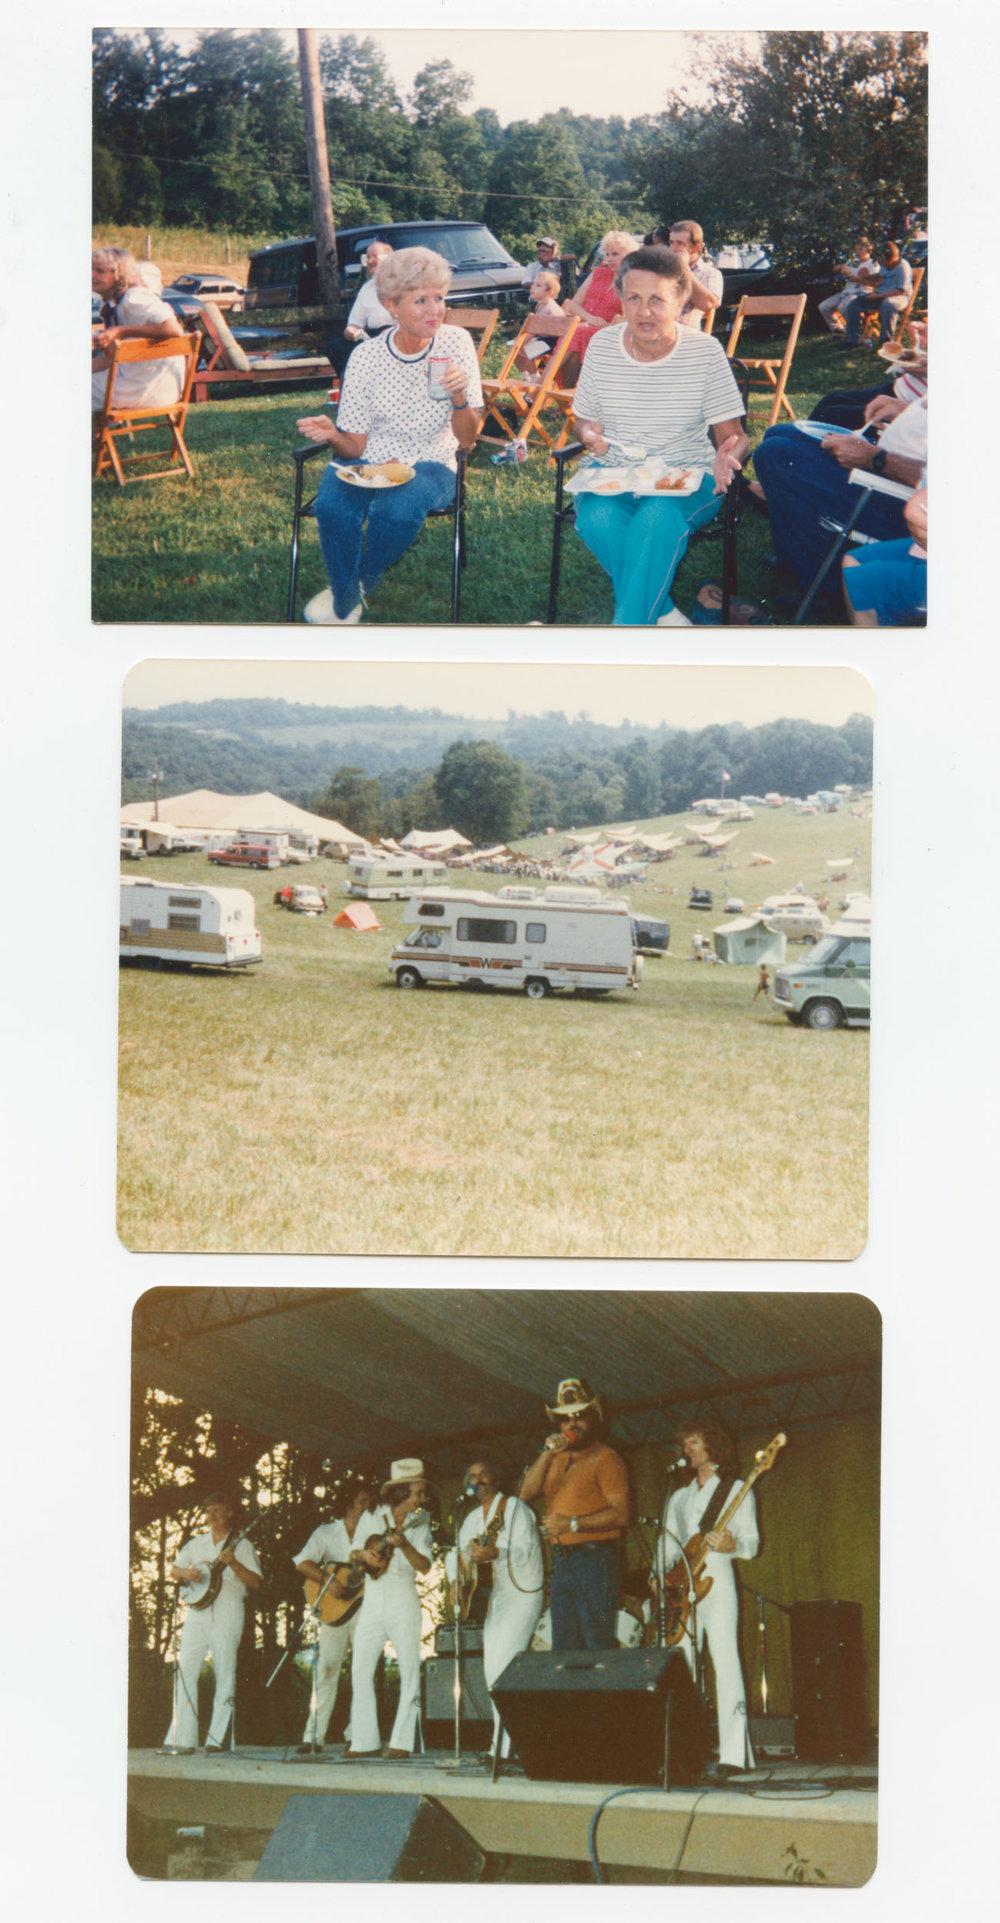 22_150809_KentuckyFriendsofBluegrassClub_07.jpg